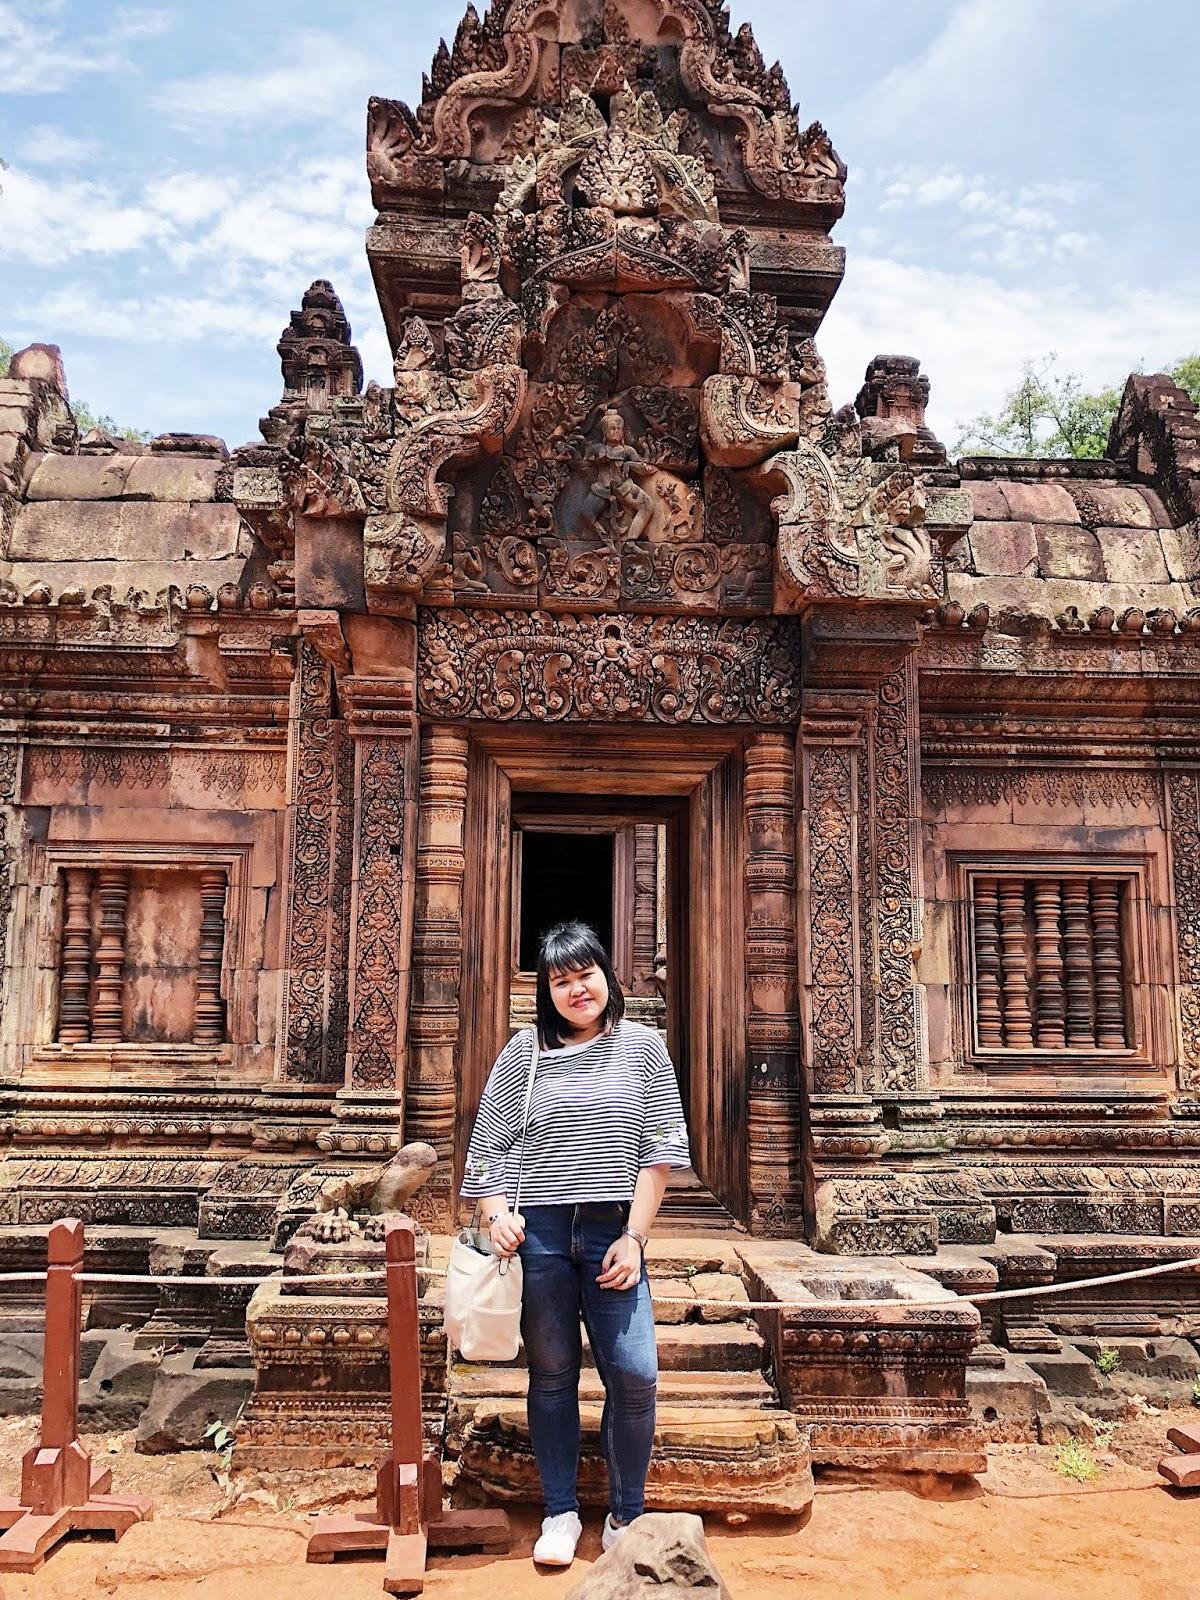 Ton posing inside Banteay Srei